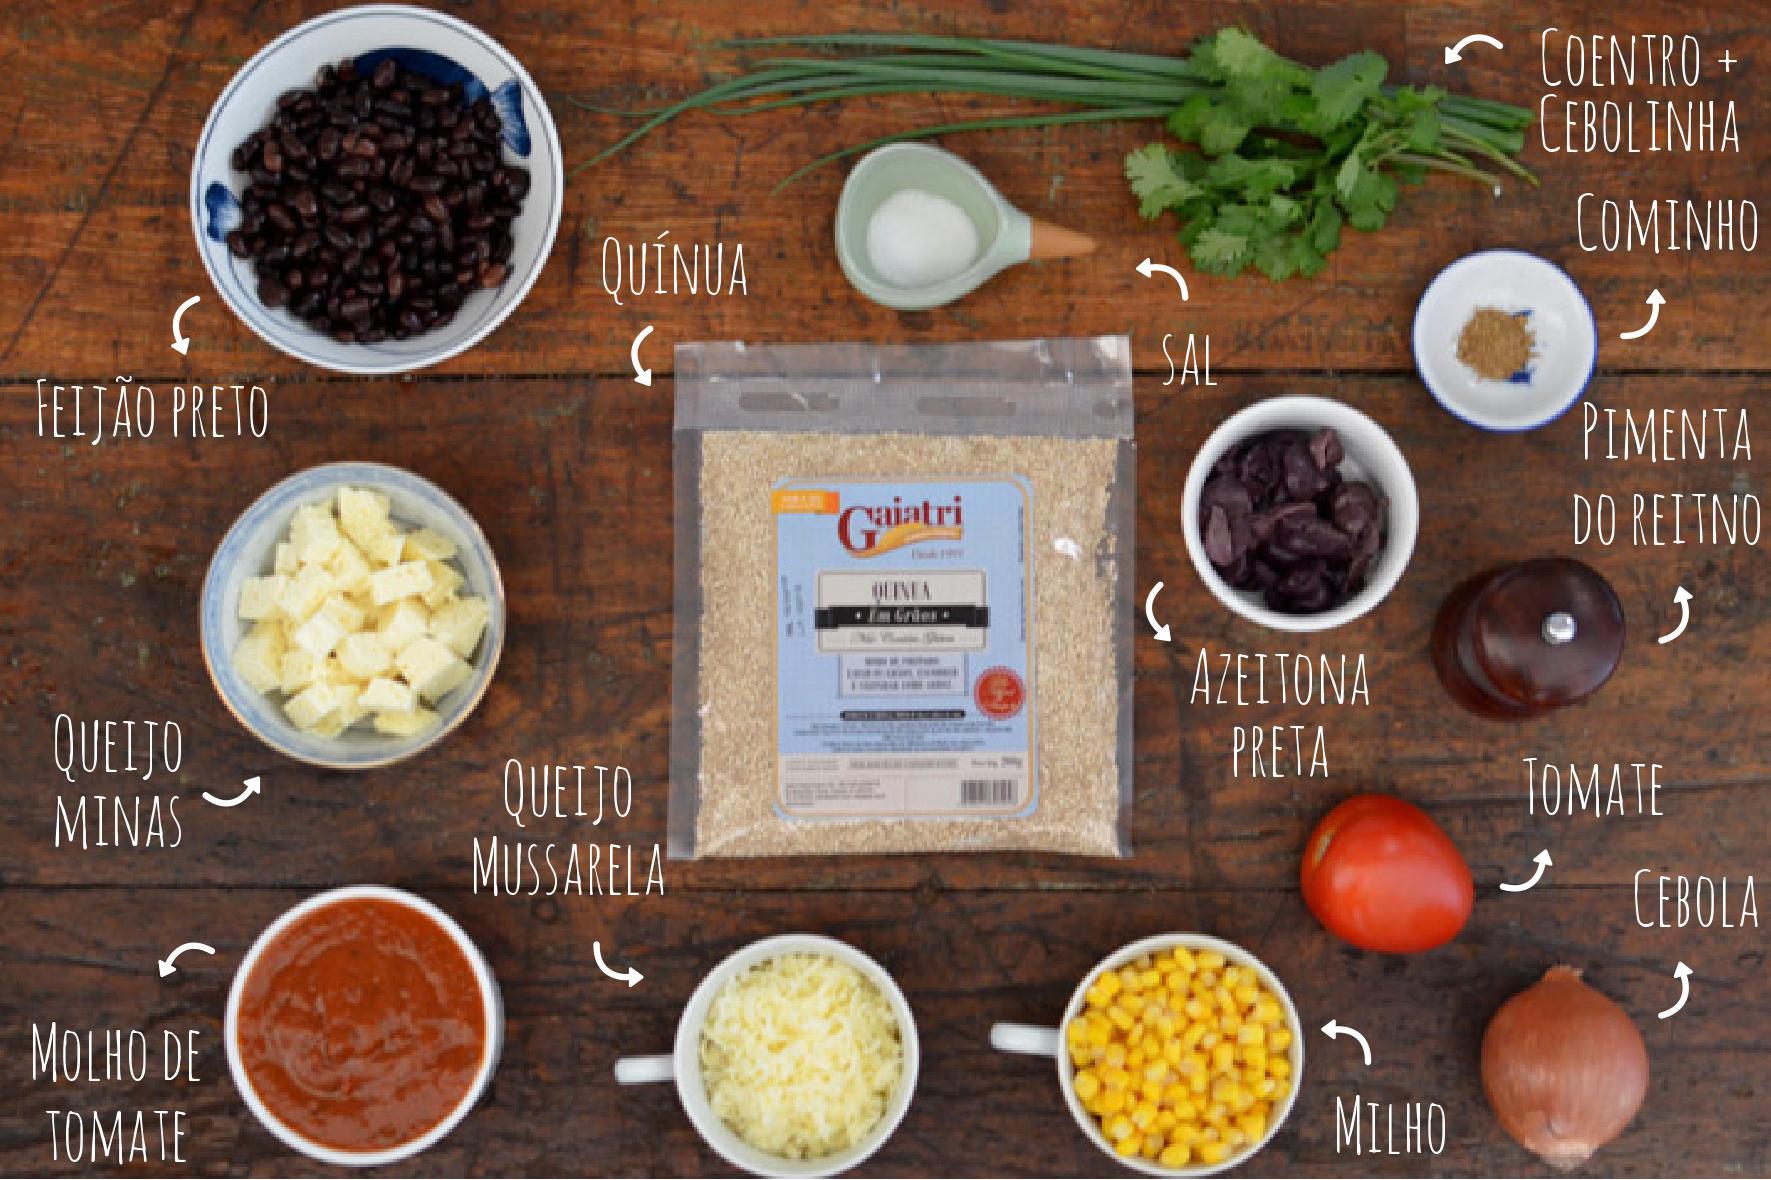 Ingredientes cassarola de quínua